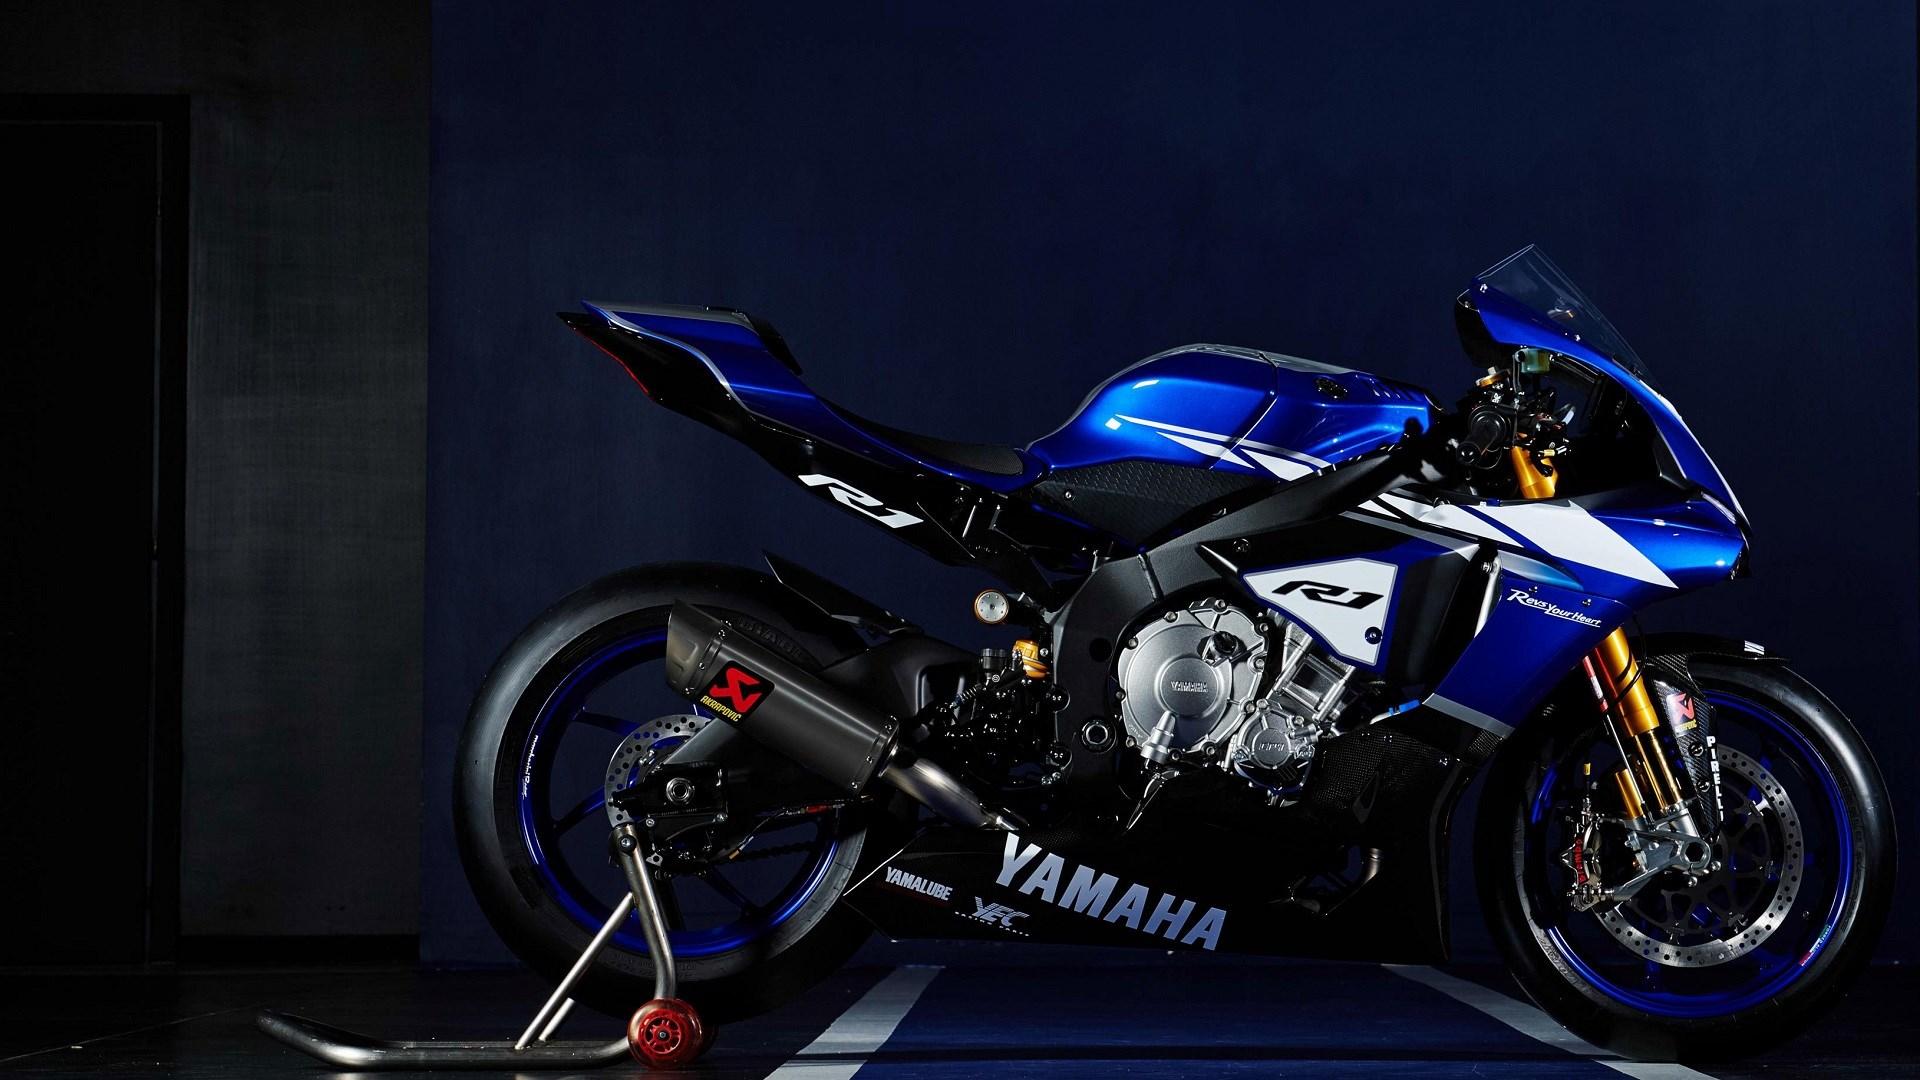 Yamaha yzf R1 Motorcycle Wallpaper 1920x1080